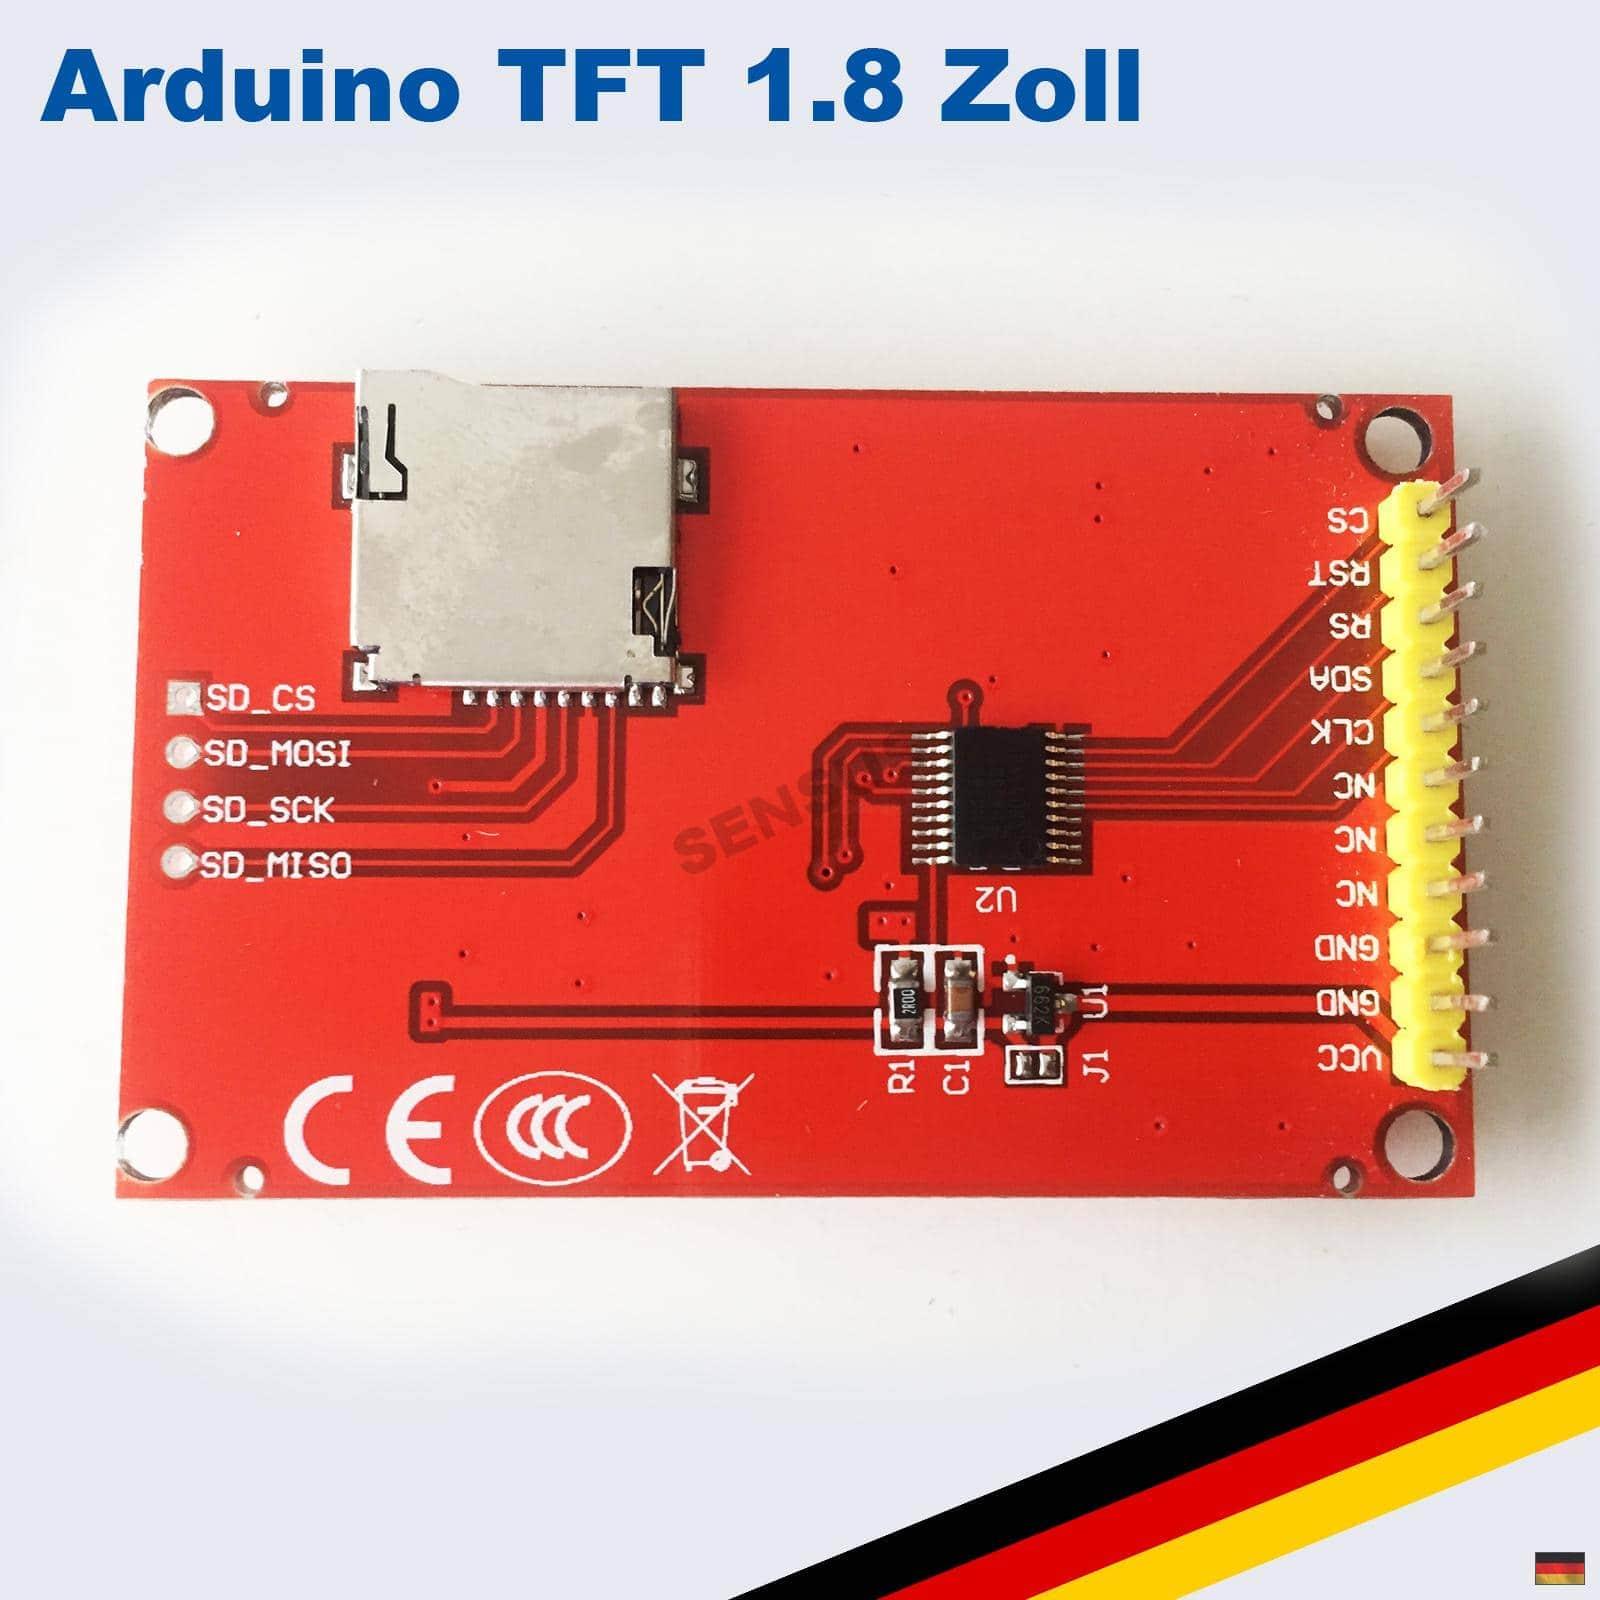 1 8 zoll tft lcd display modul 128x160 spi sd st7735. Black Bedroom Furniture Sets. Home Design Ideas